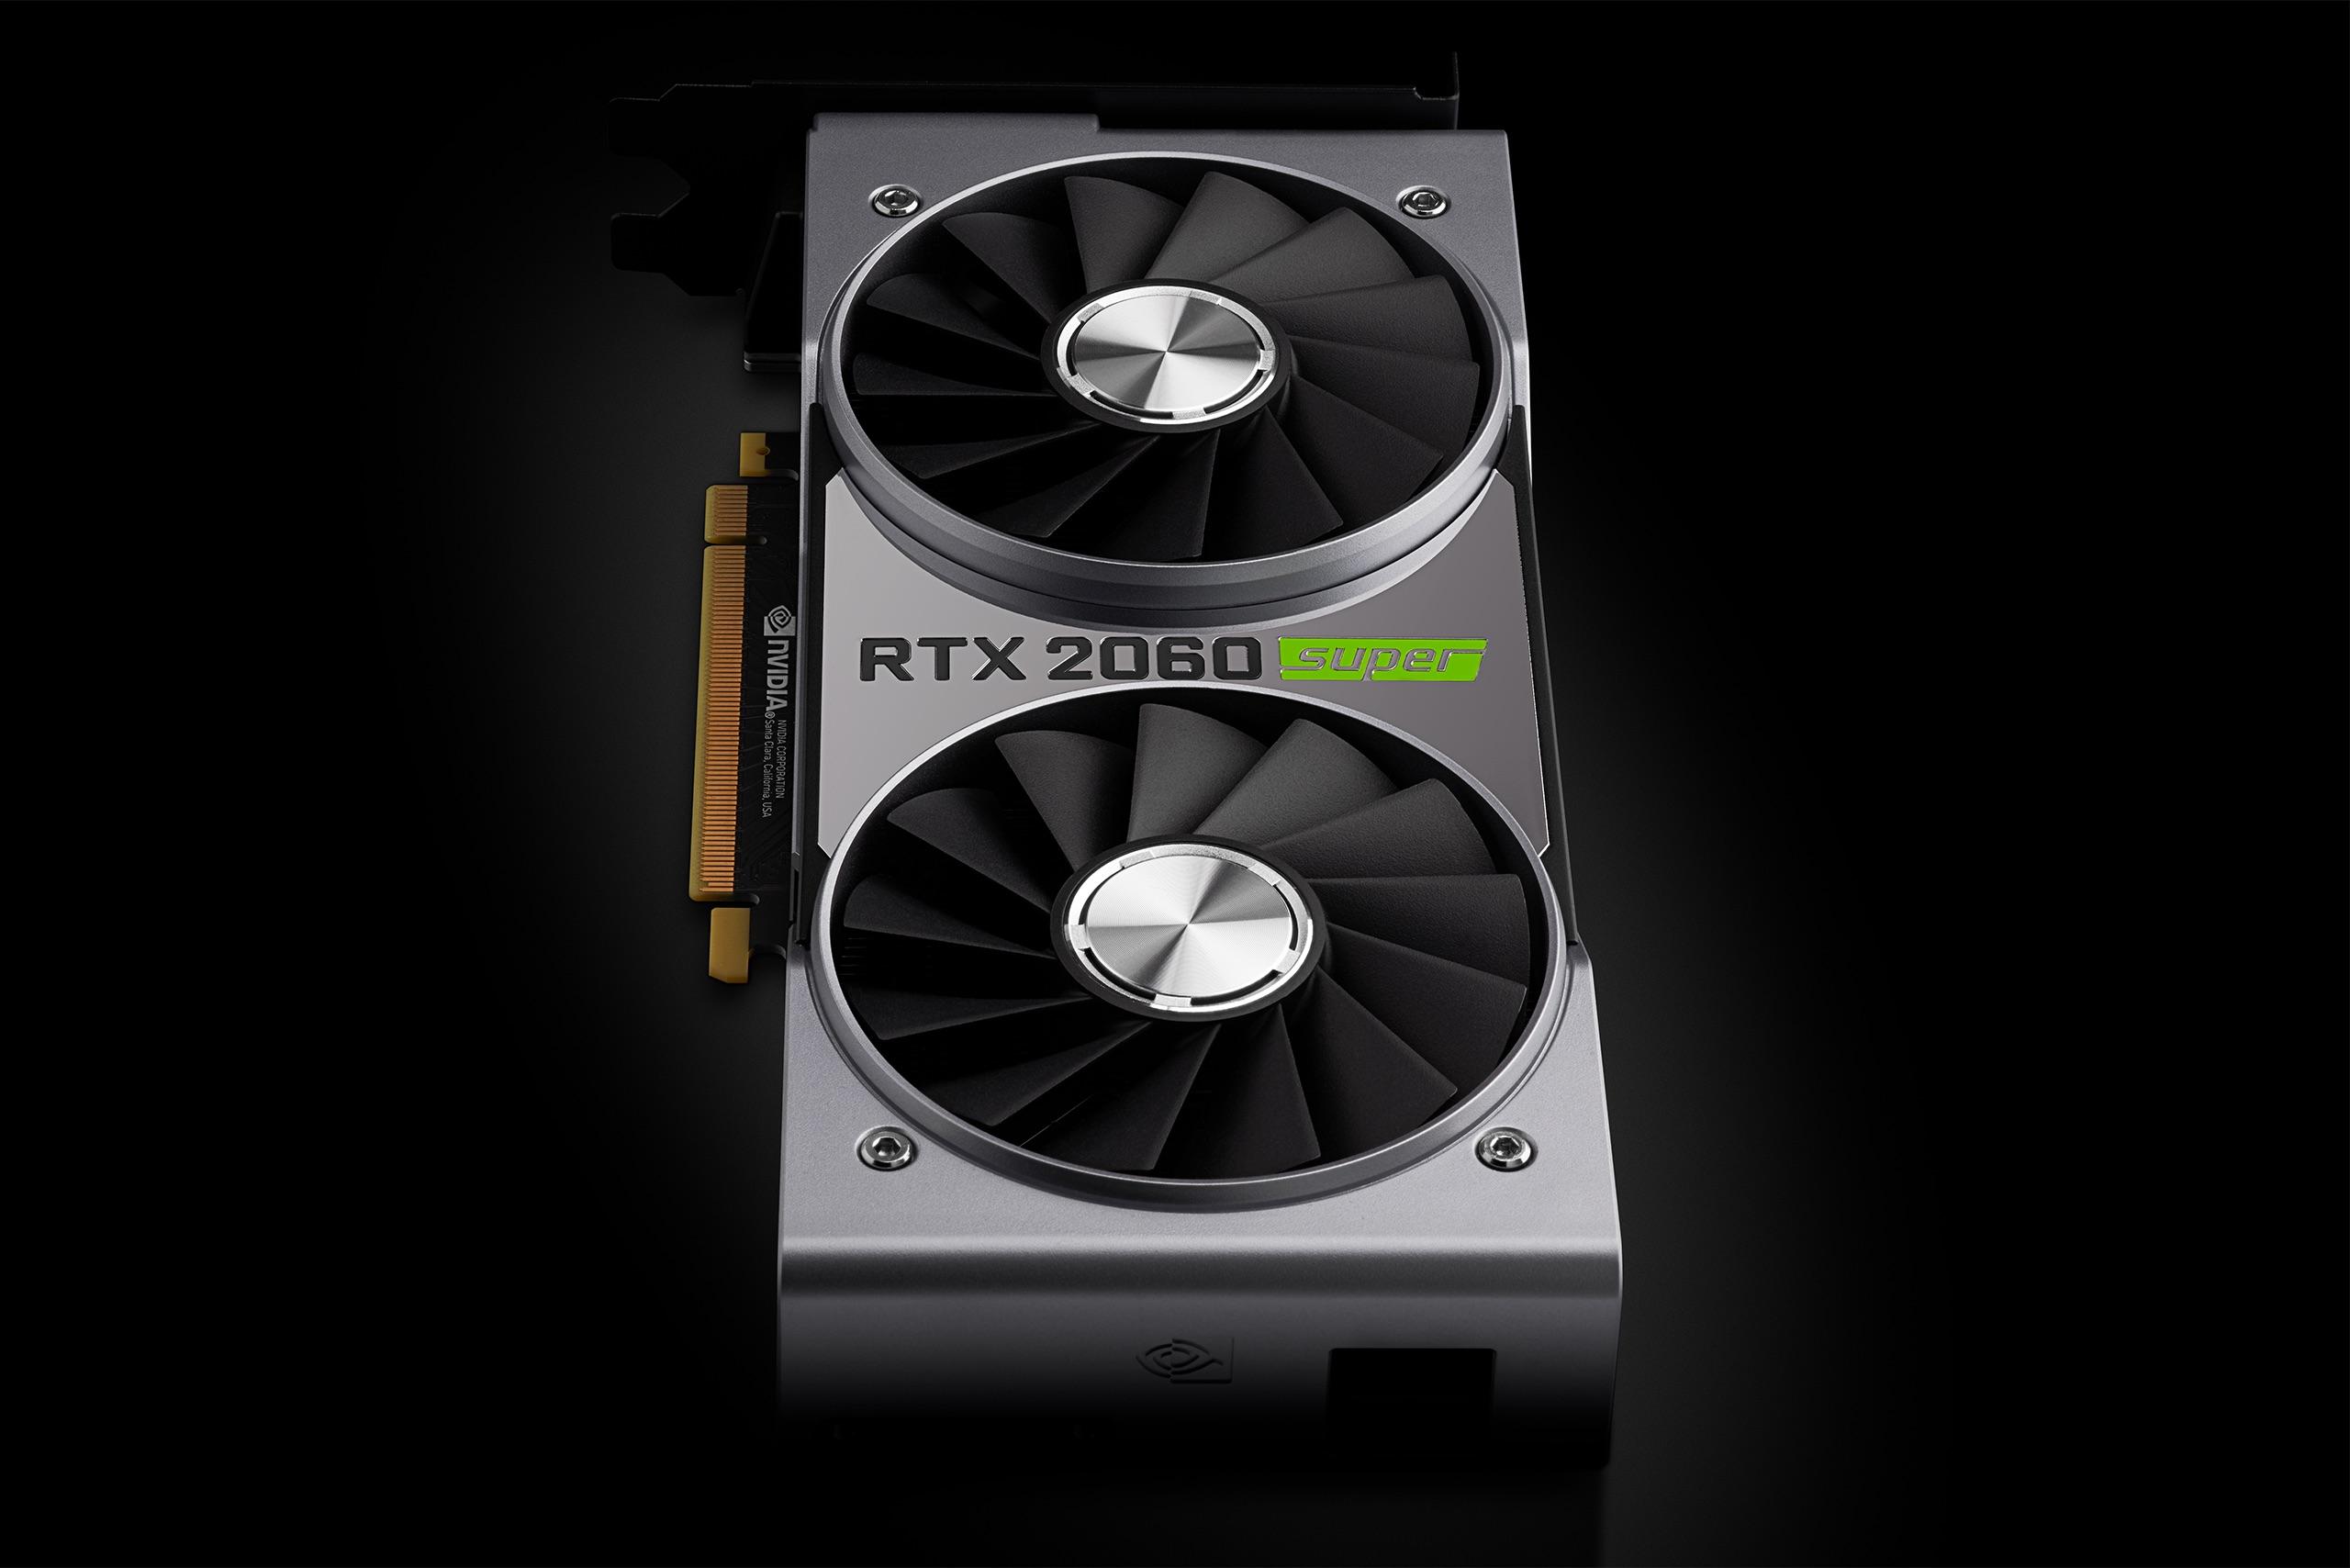 GeForce RTX 2060 Super image